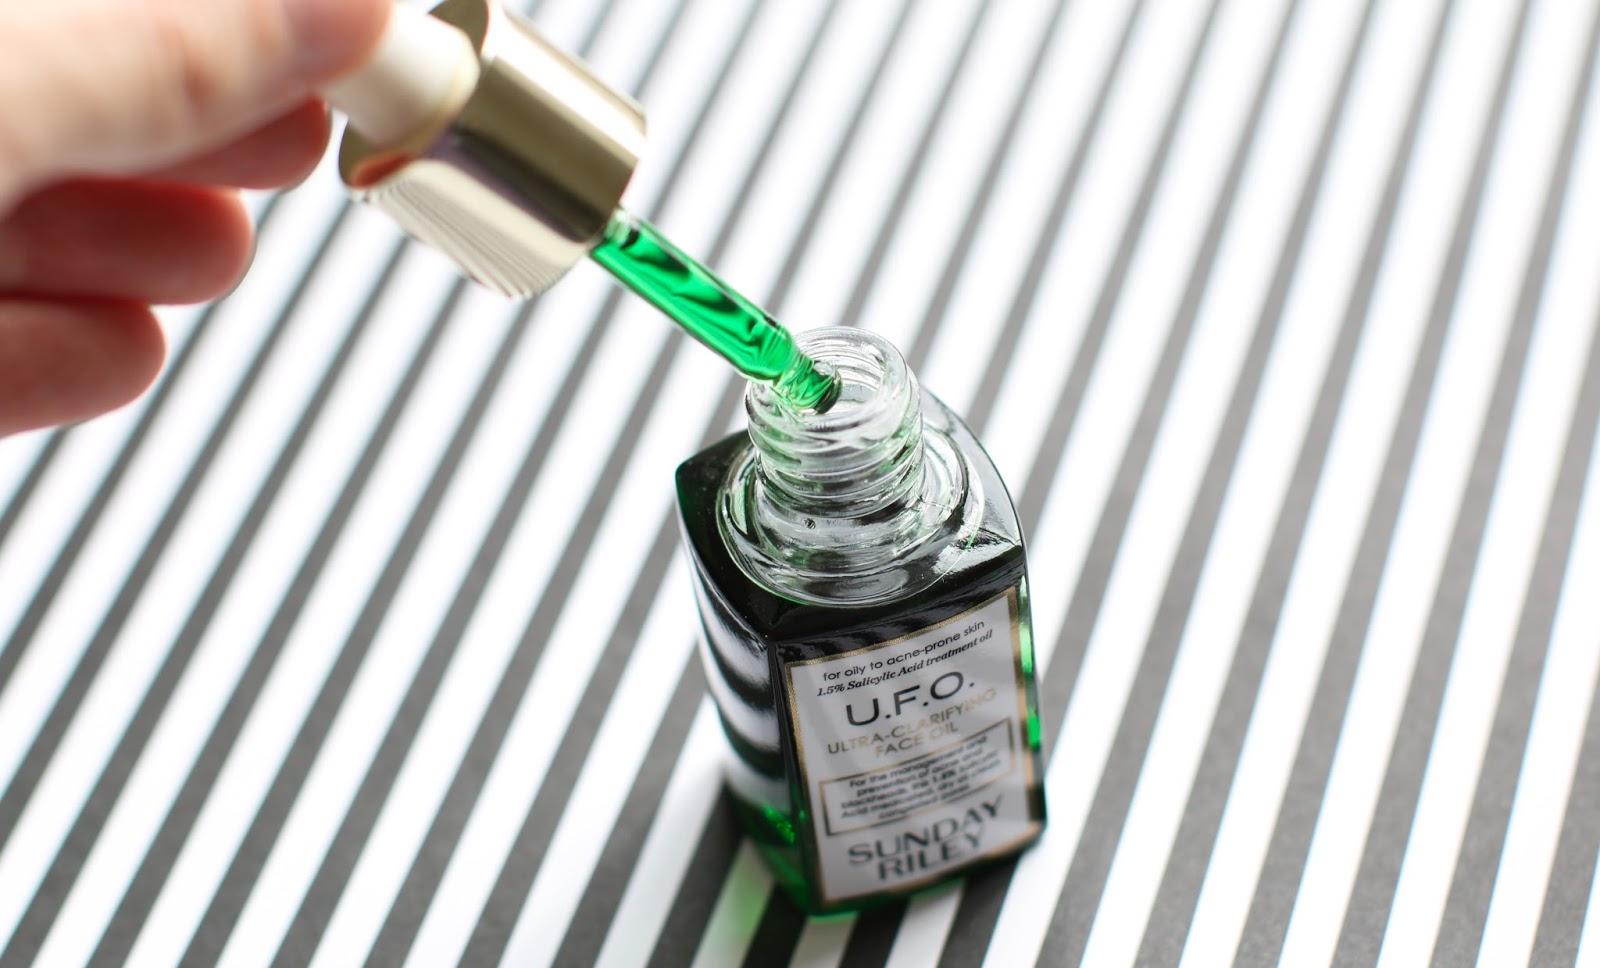 Sunday Riley U.F.O. Clarifying Oil review